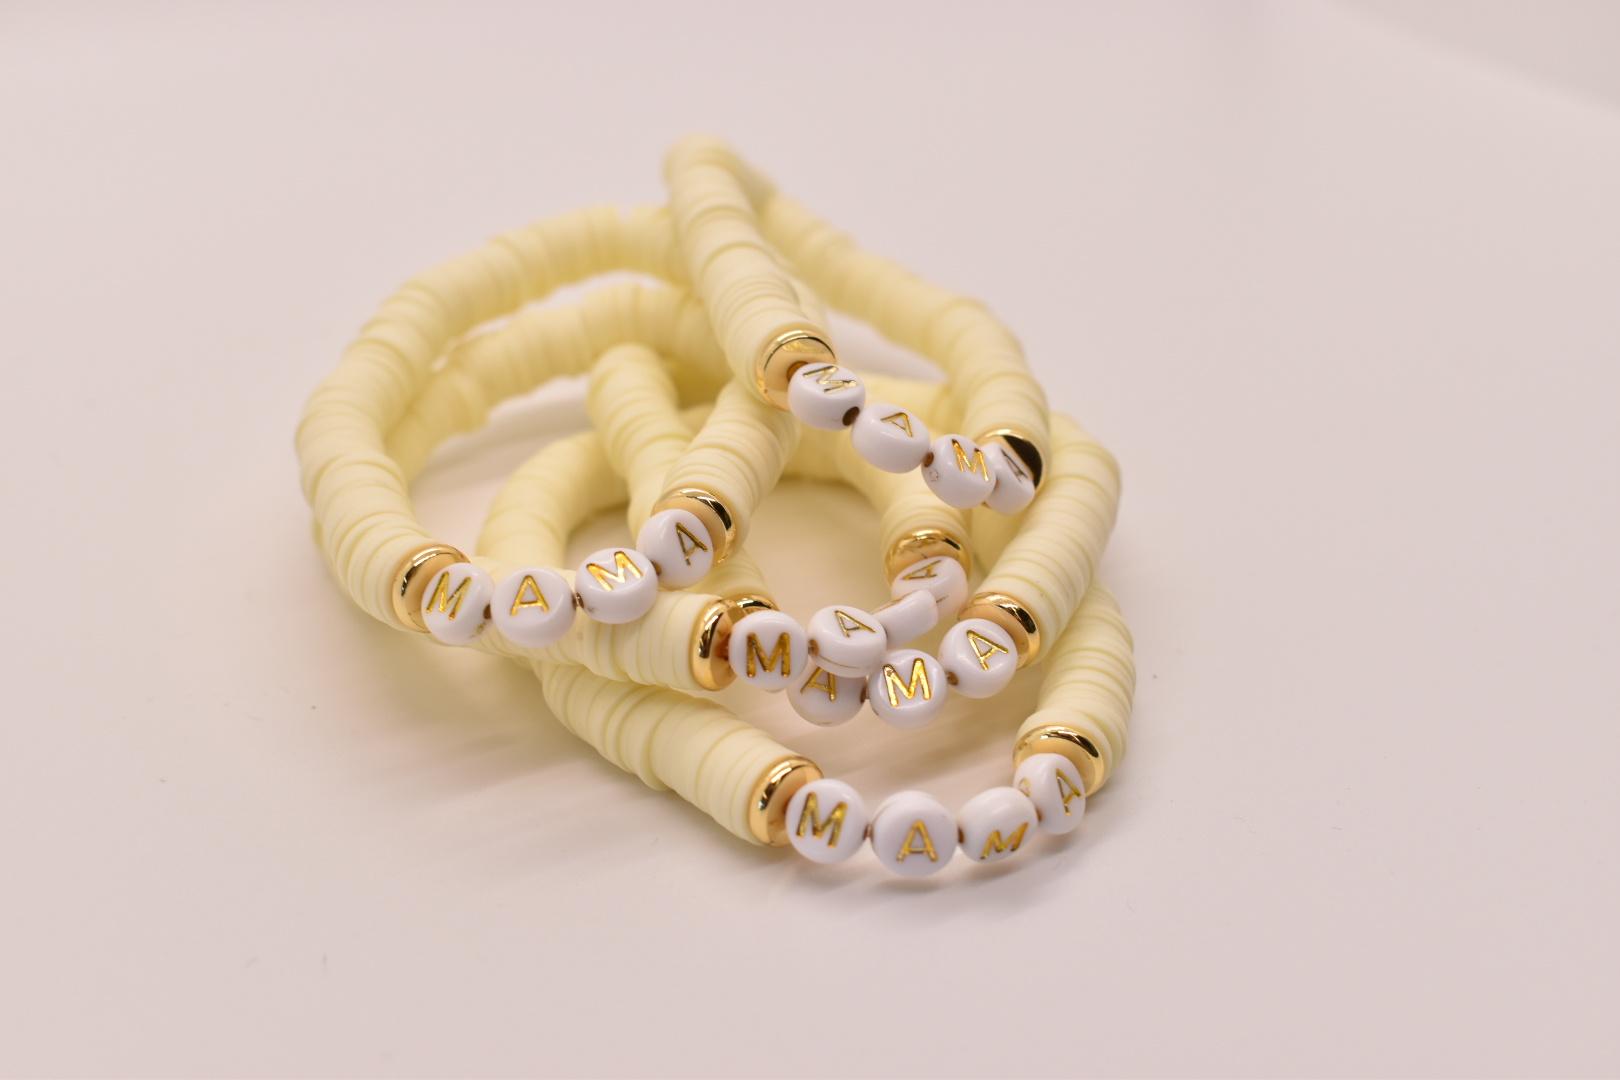 Mod Miss Jewelry - MM MM JEBR - Mama Color Pop Bracelet, Banana Cream, Medium